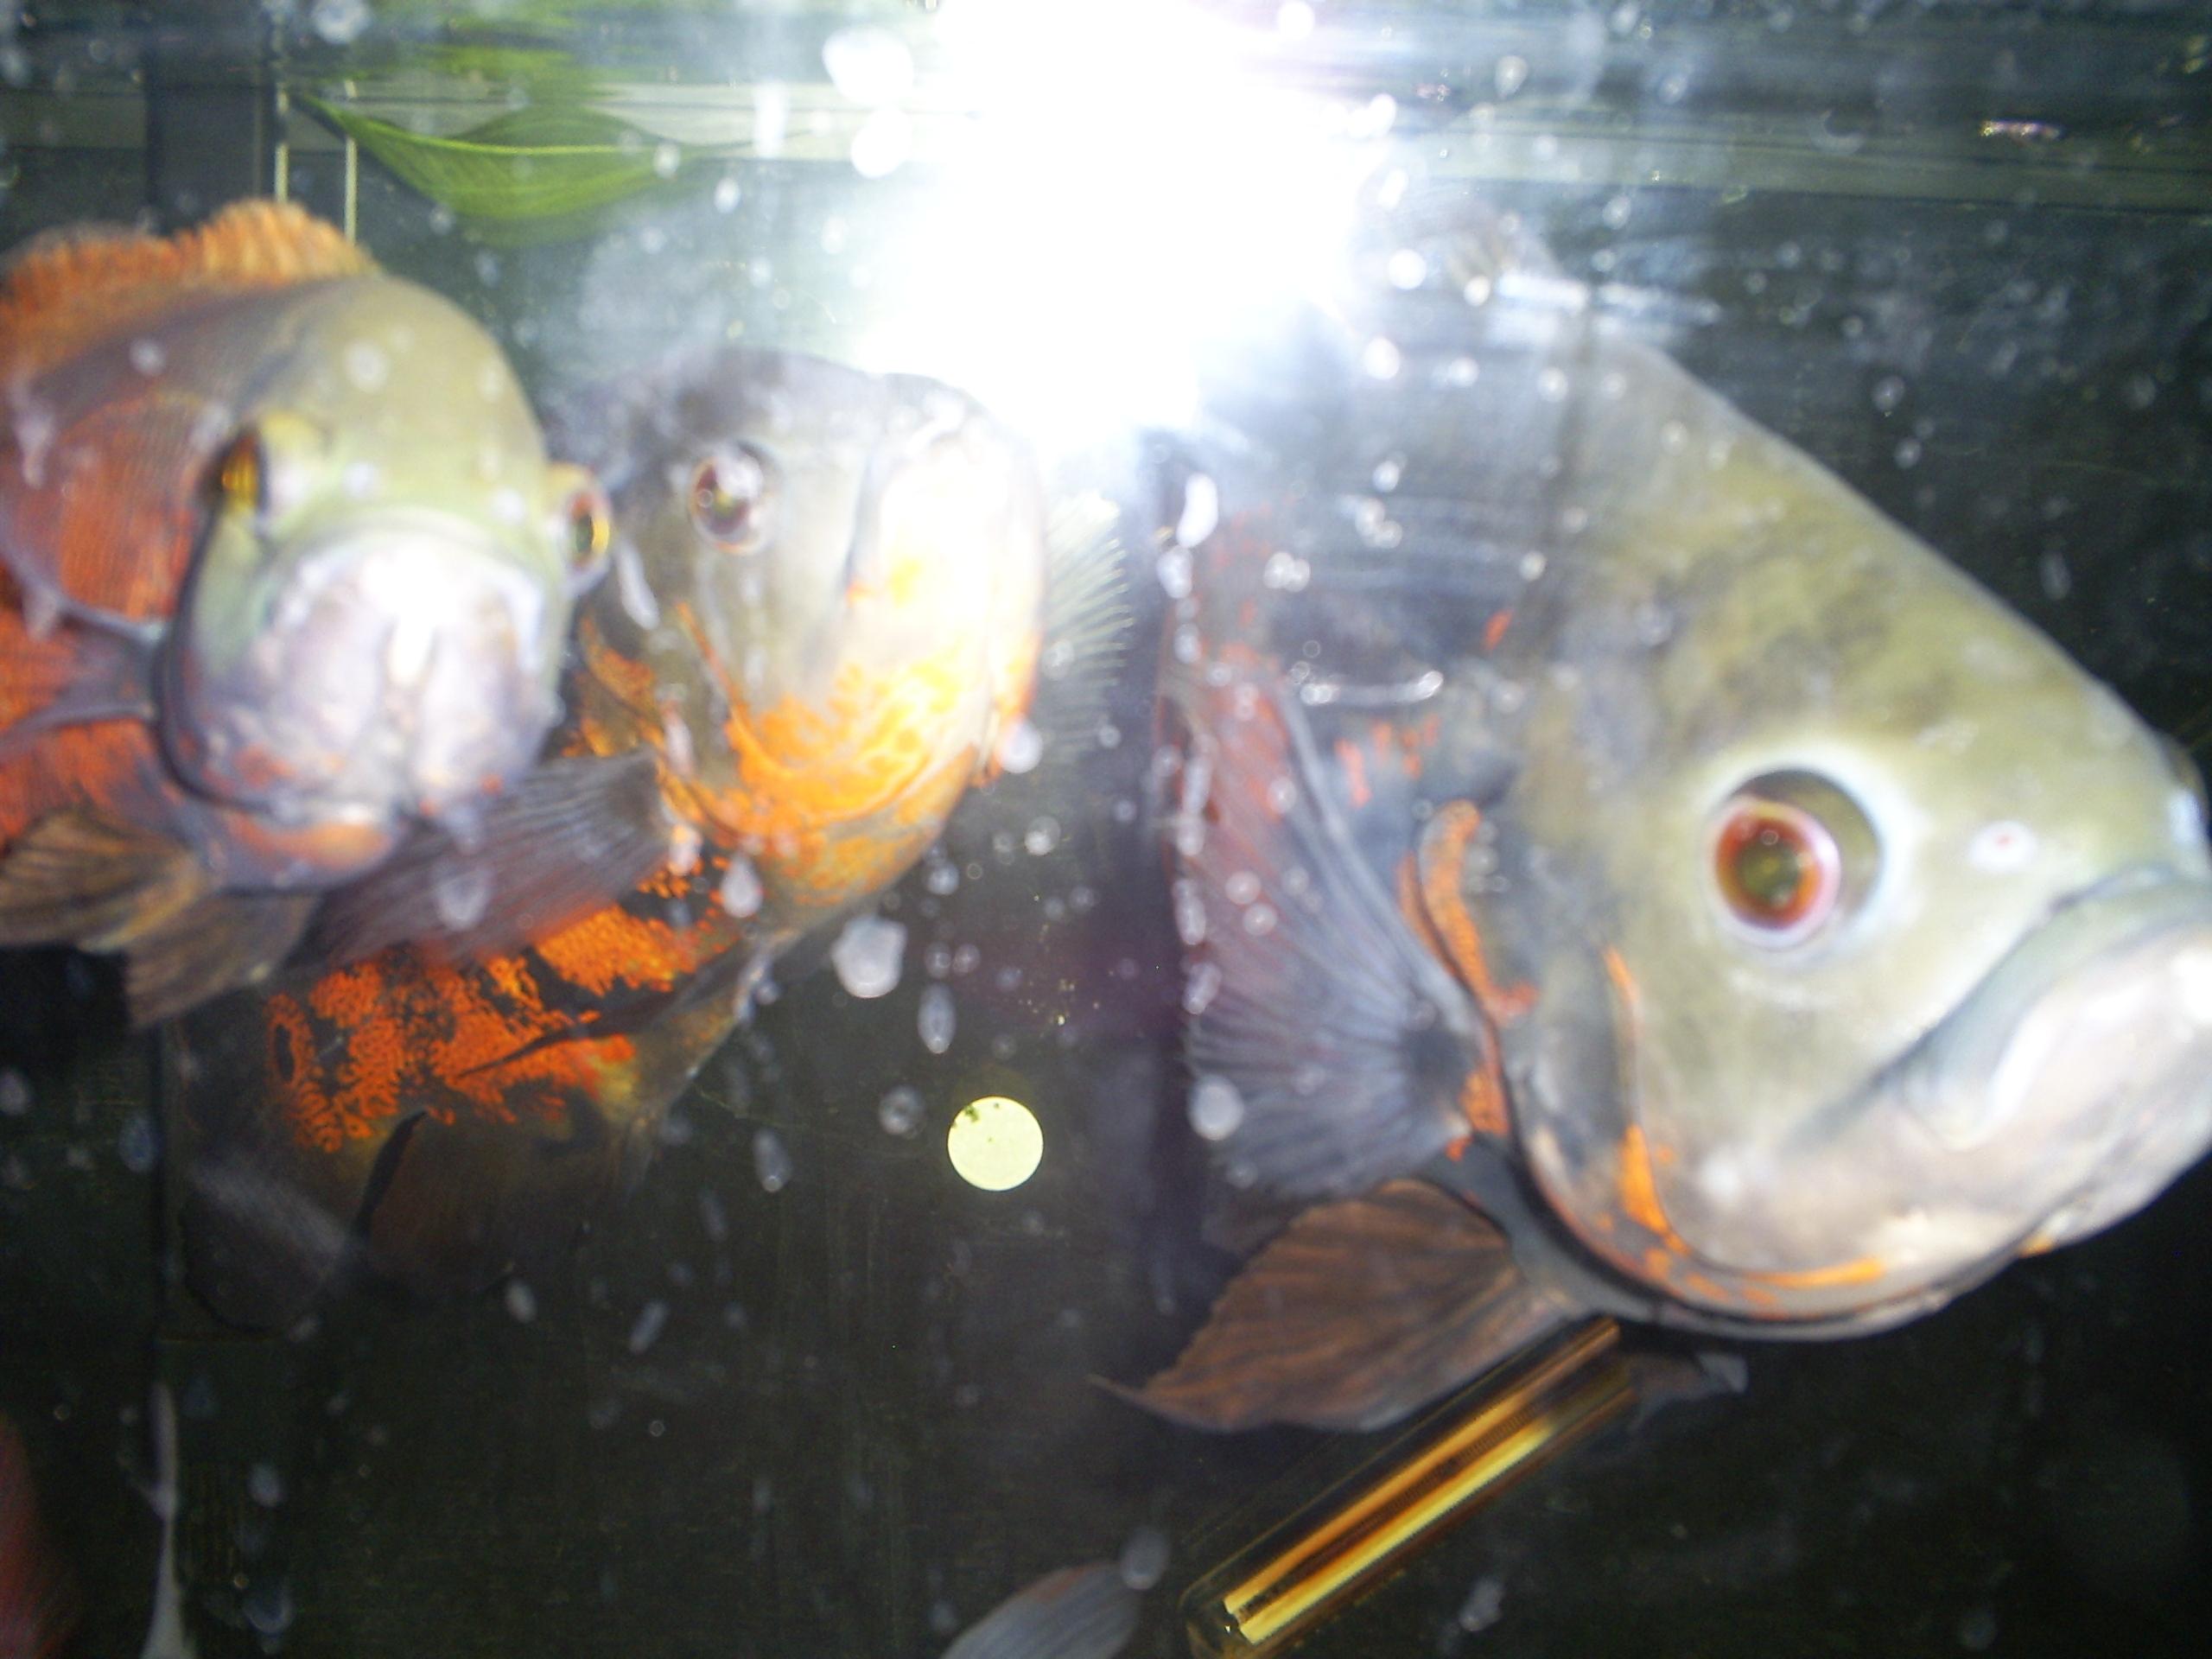 Full grown oscar fish - photo#6